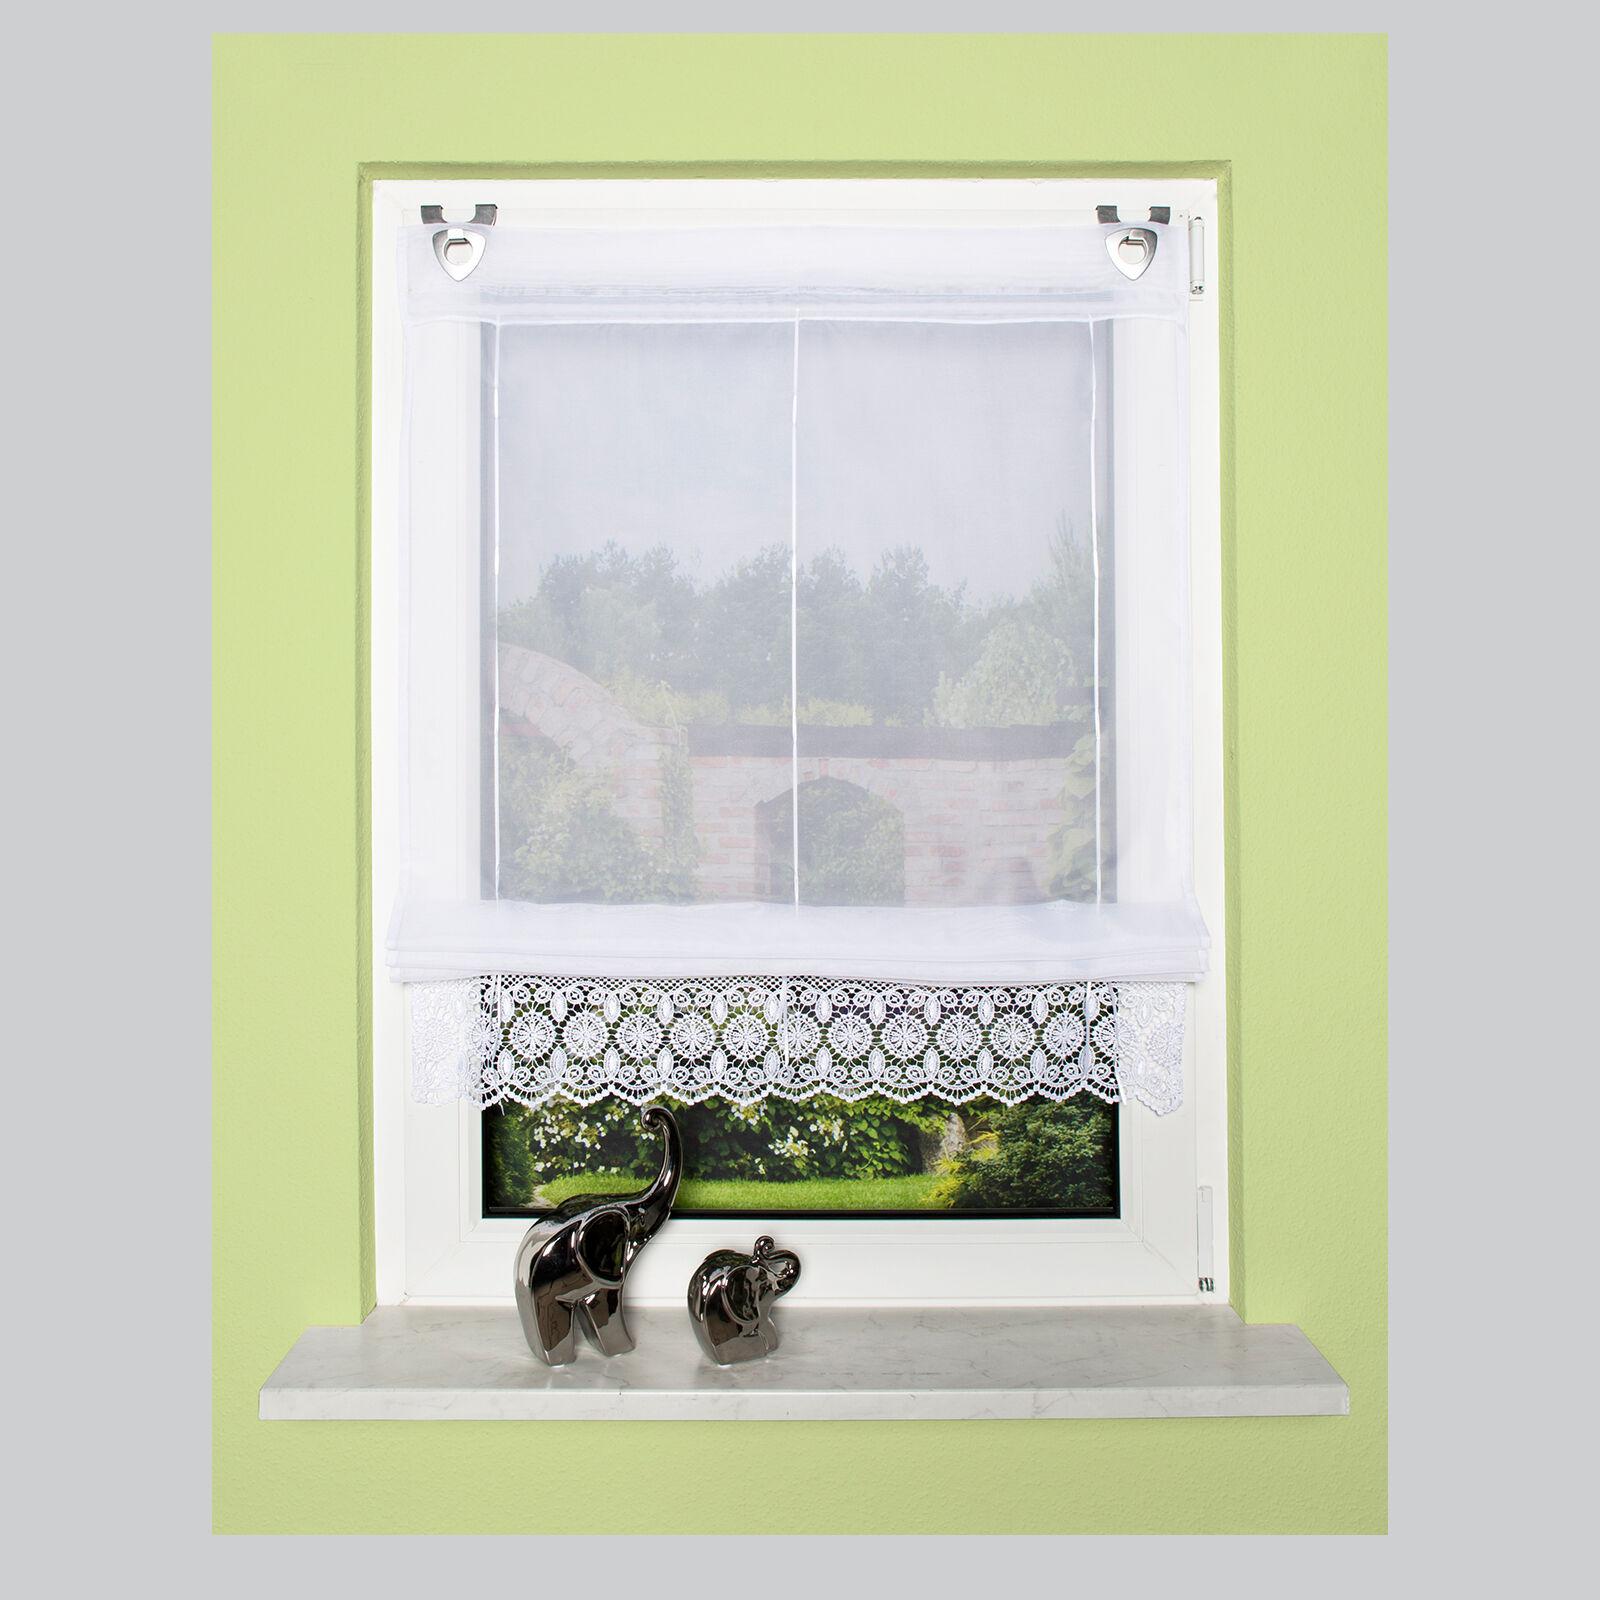 spitze stickerei raffrollo raffstore rollo easyfix home wohnideen schmidtgard ebay. Black Bedroom Furniture Sets. Home Design Ideas